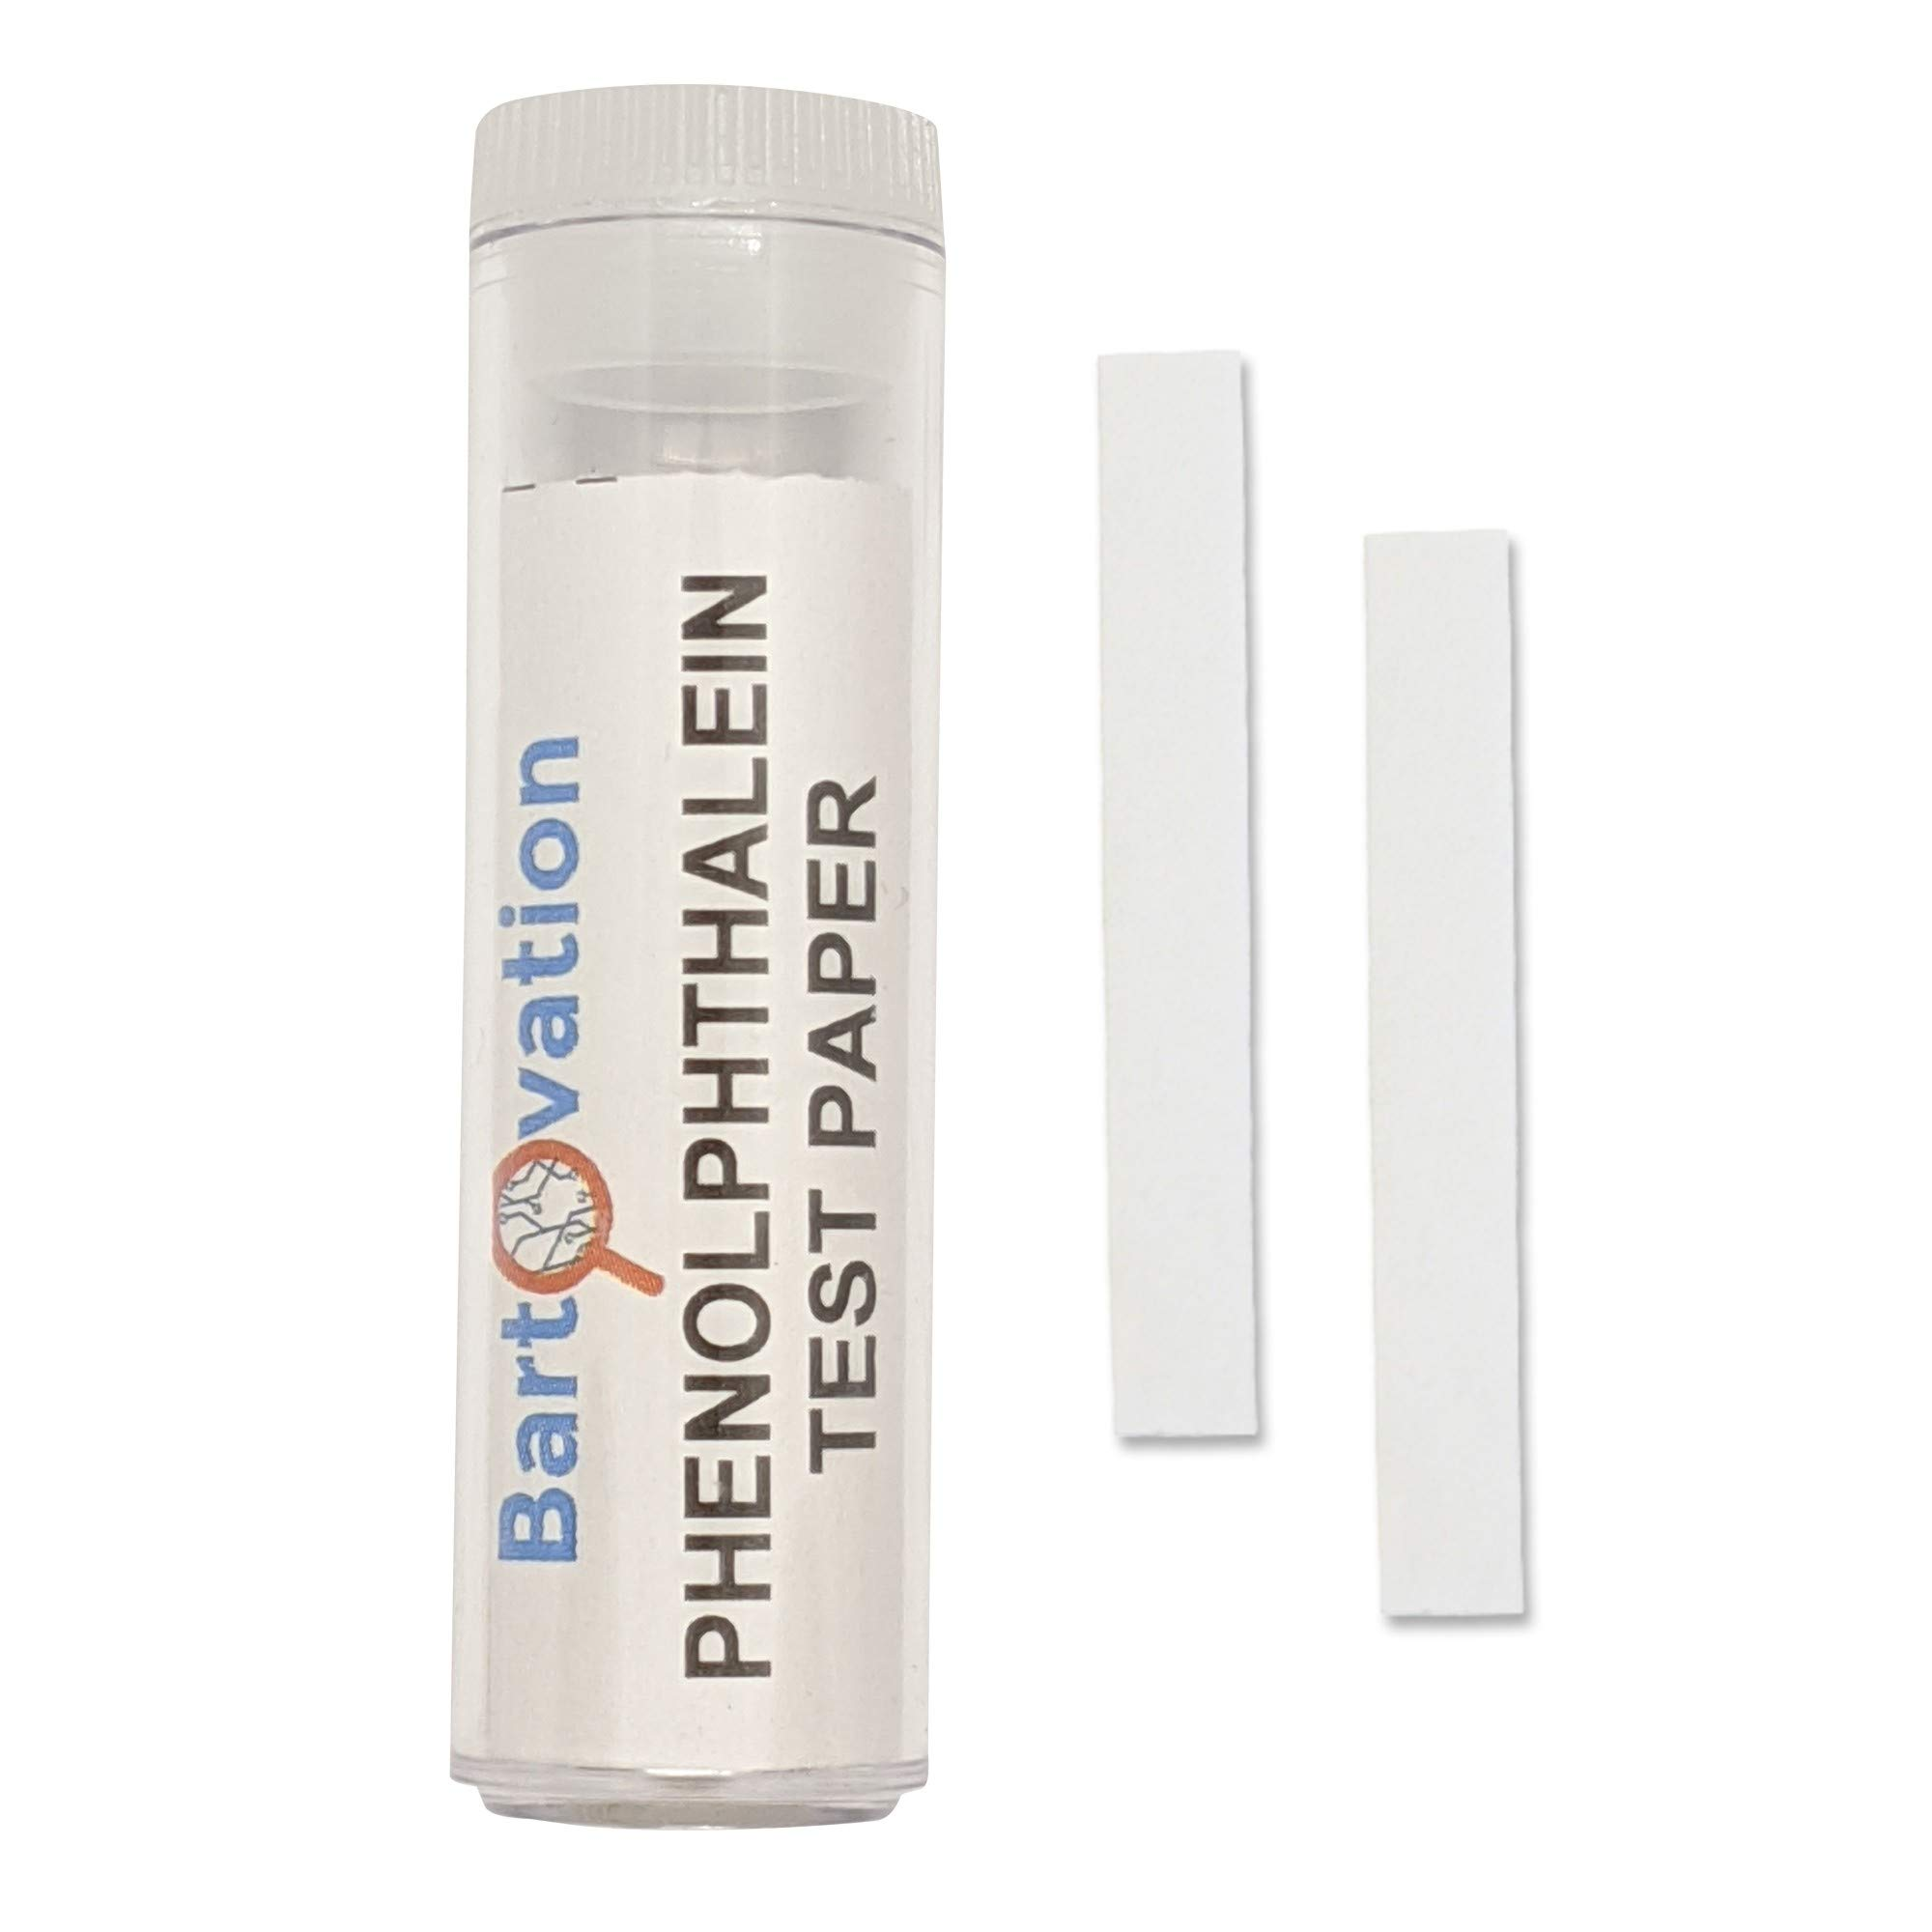 Phenolphthalein Test Paper [Vial of 100 Paper Strips] for Qualitative Leak Detection of Ammonia Vapors